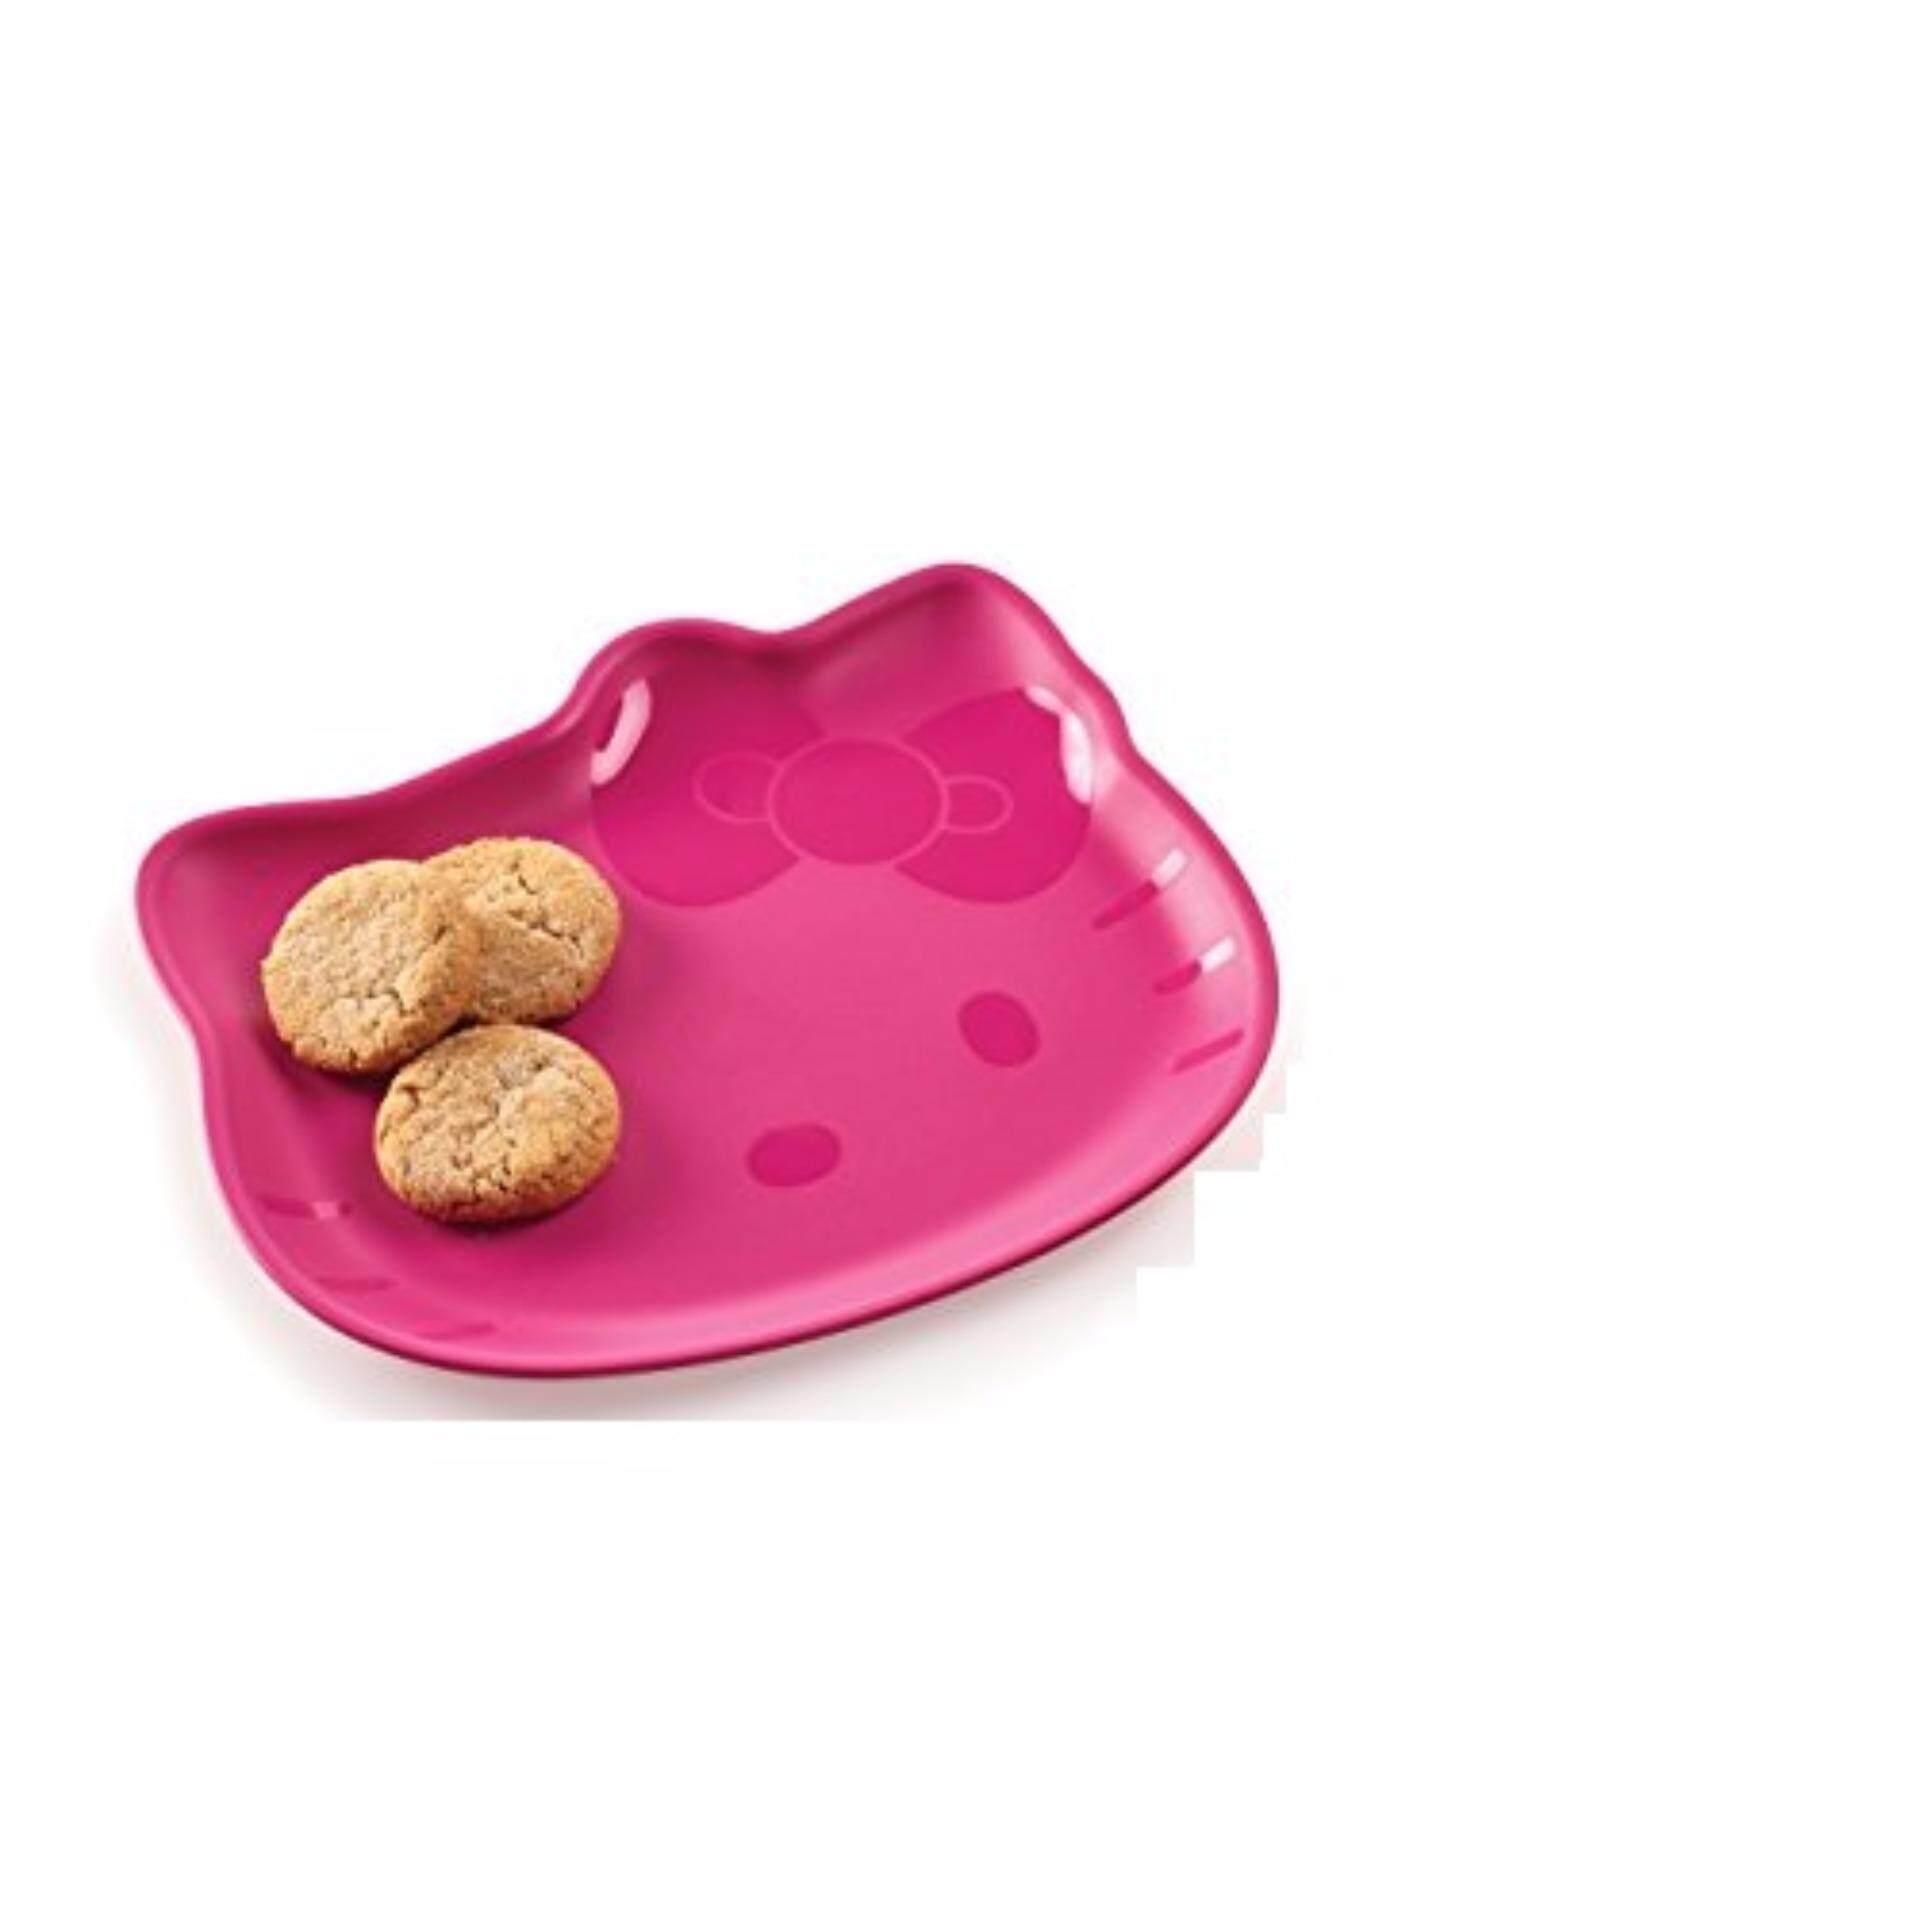 Tupperware Hello Kitty Plates (2) Random Color Send